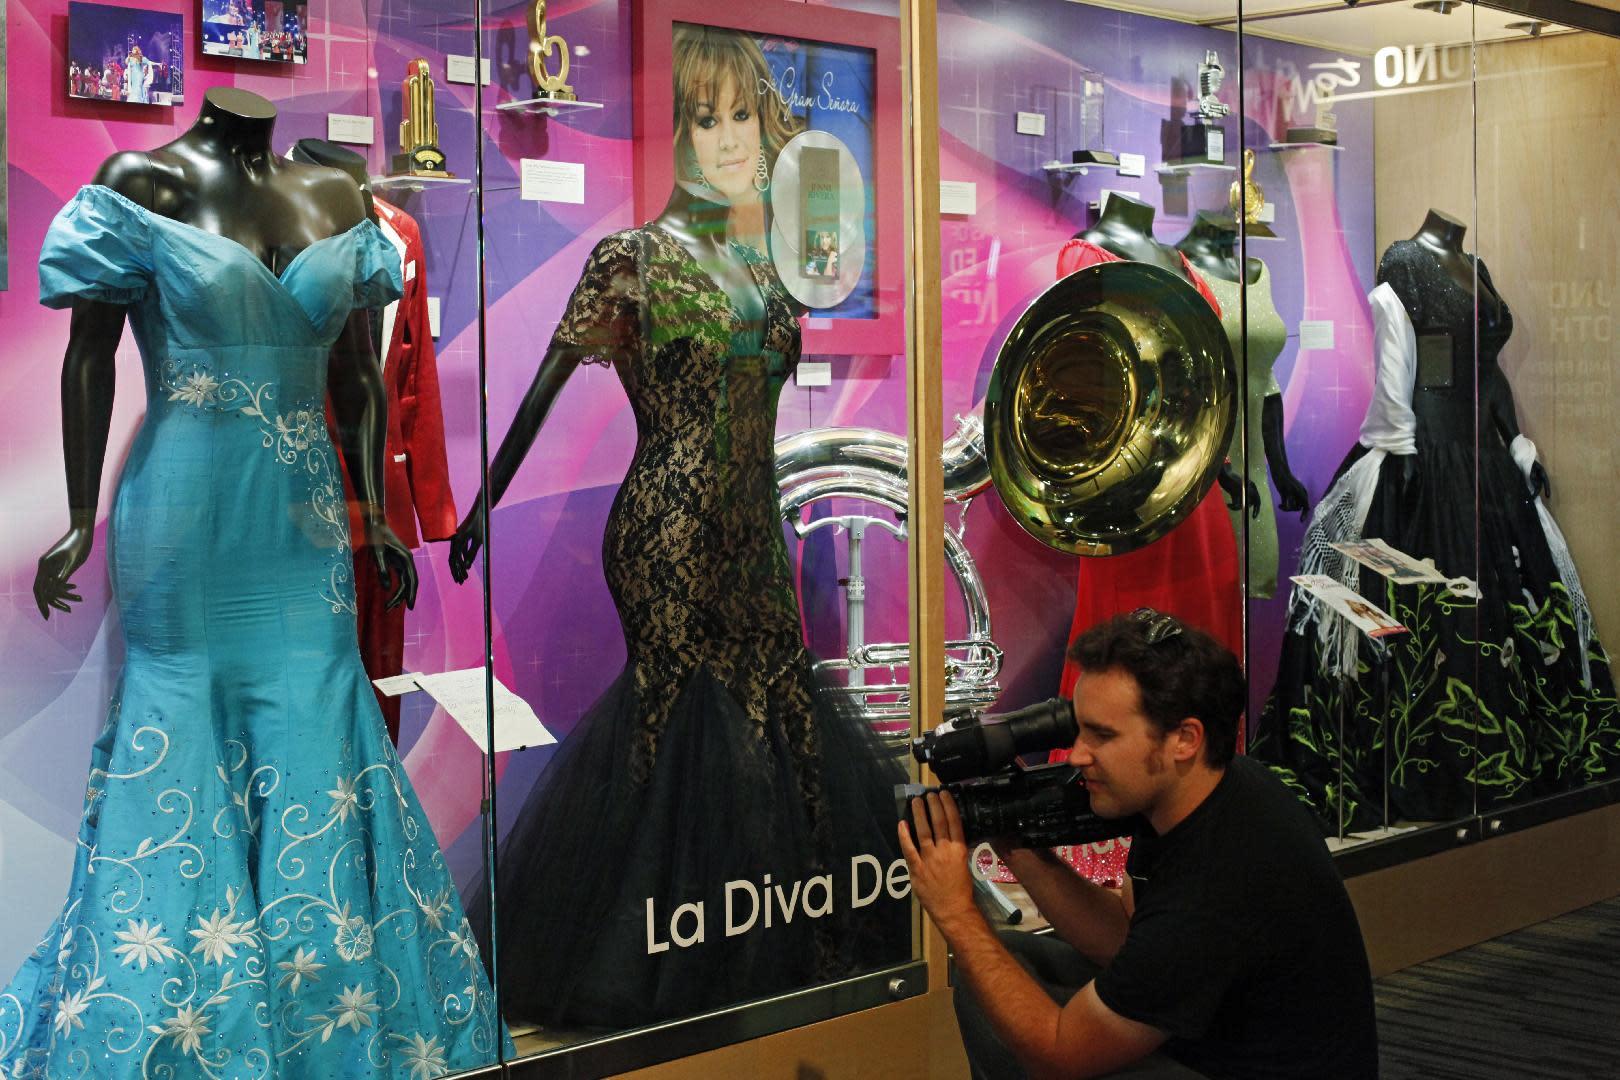 Museo Del Grammy Abre Exposicin De Jenni Rivera